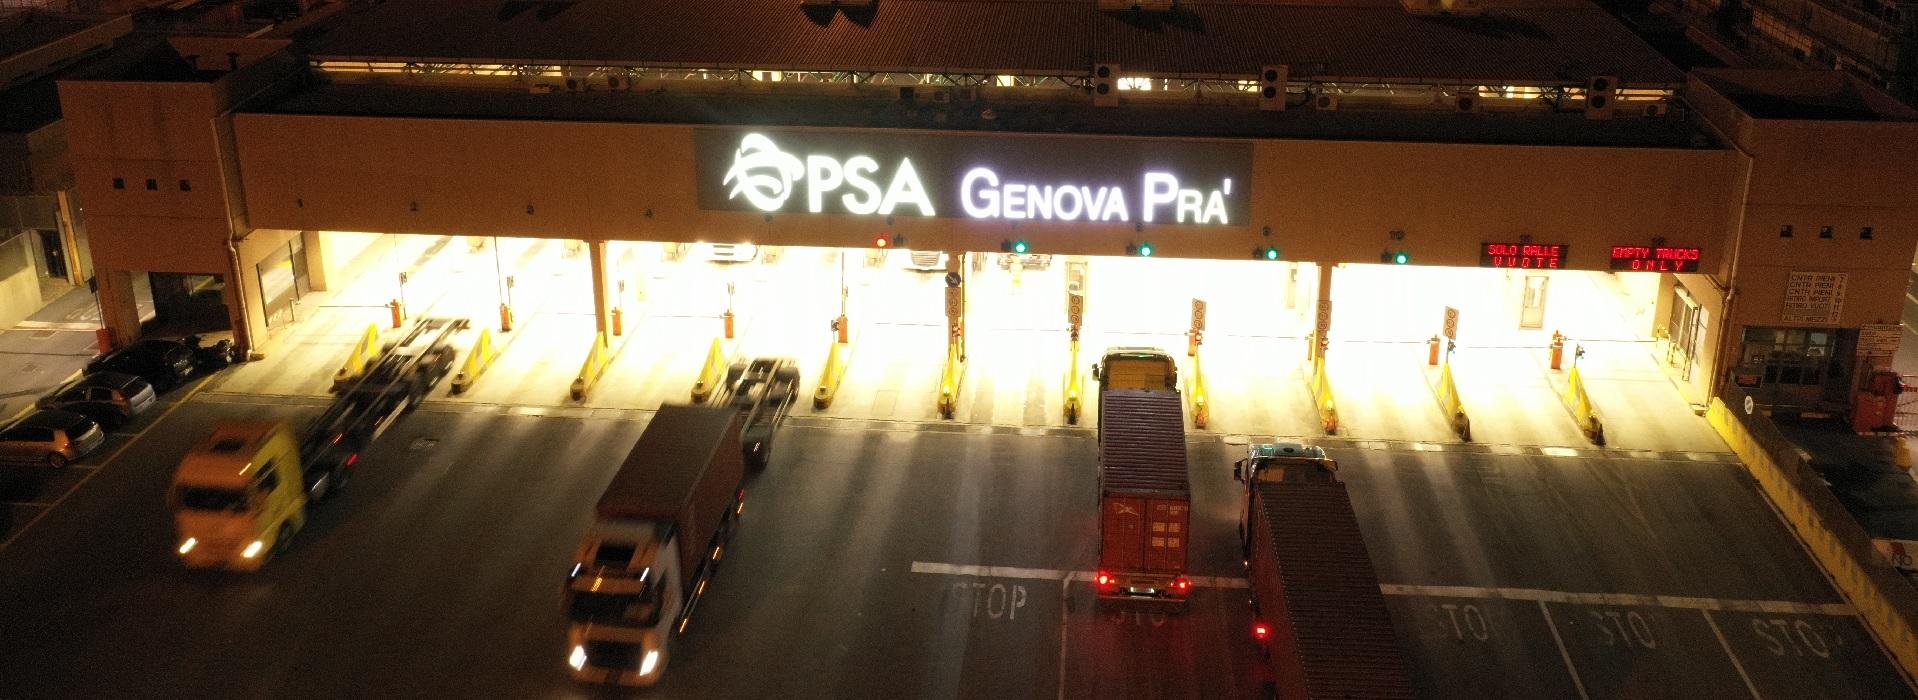 PSA Image